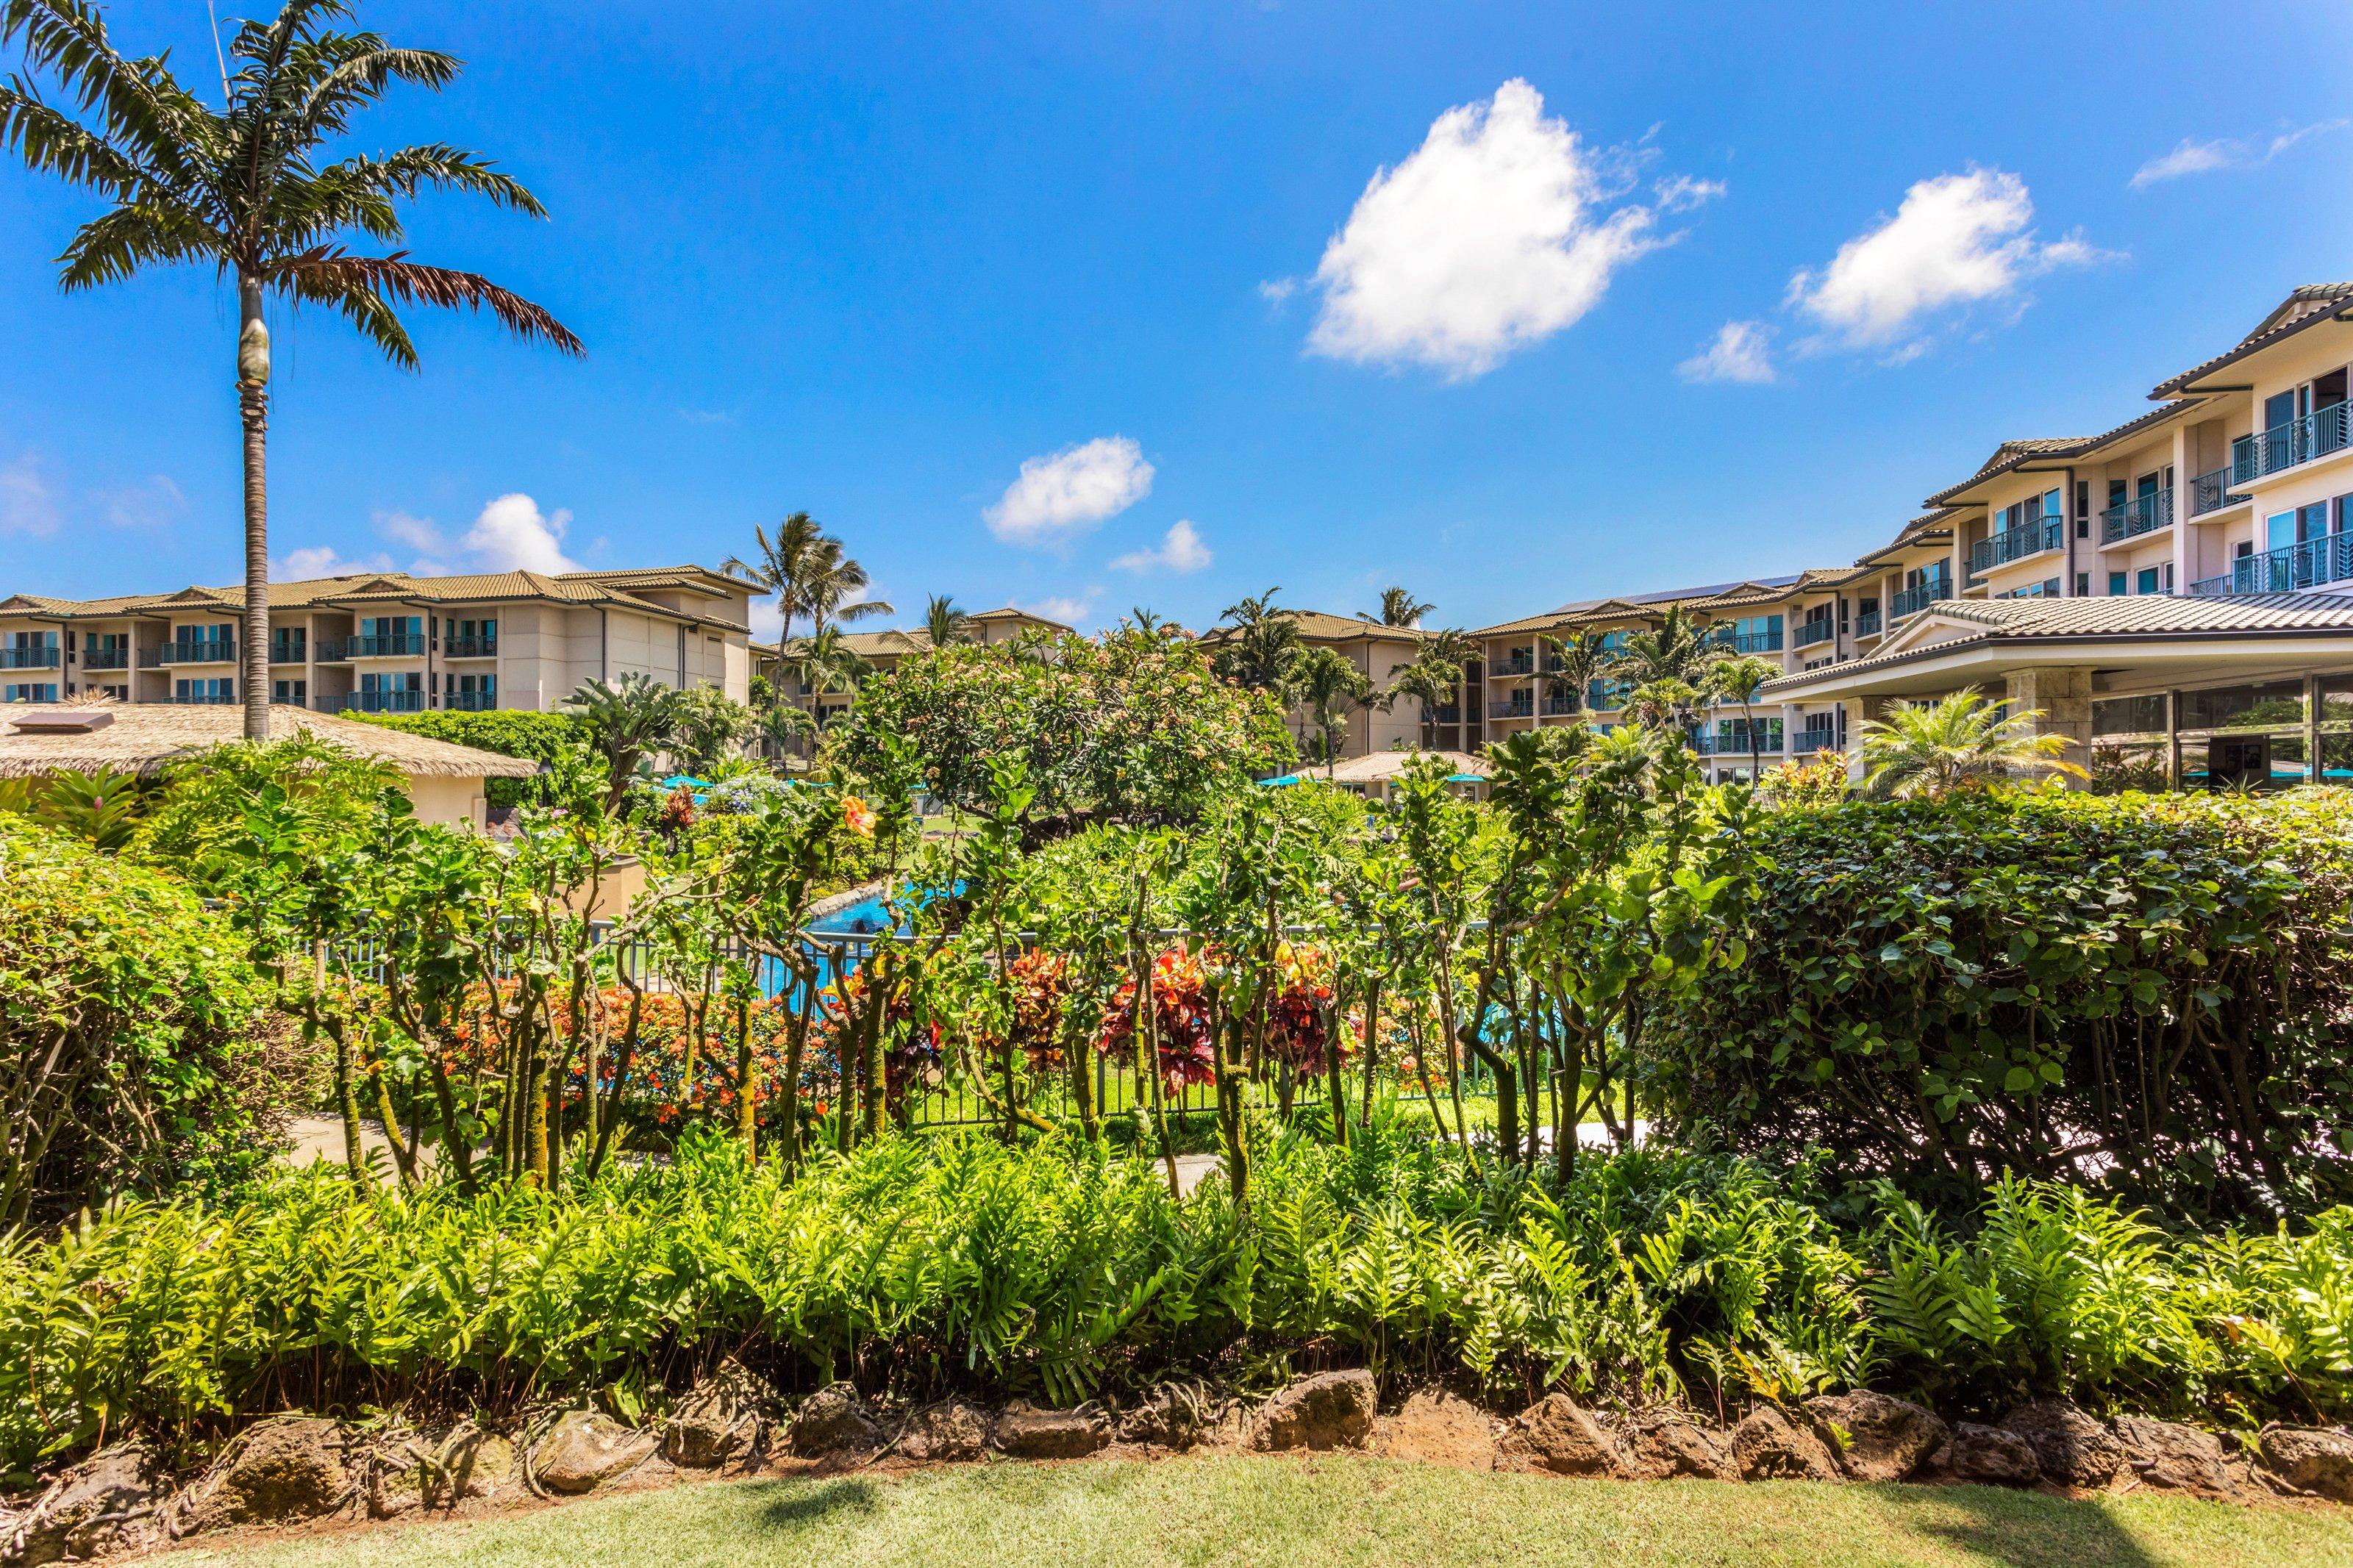 waipouli beach resort for sale